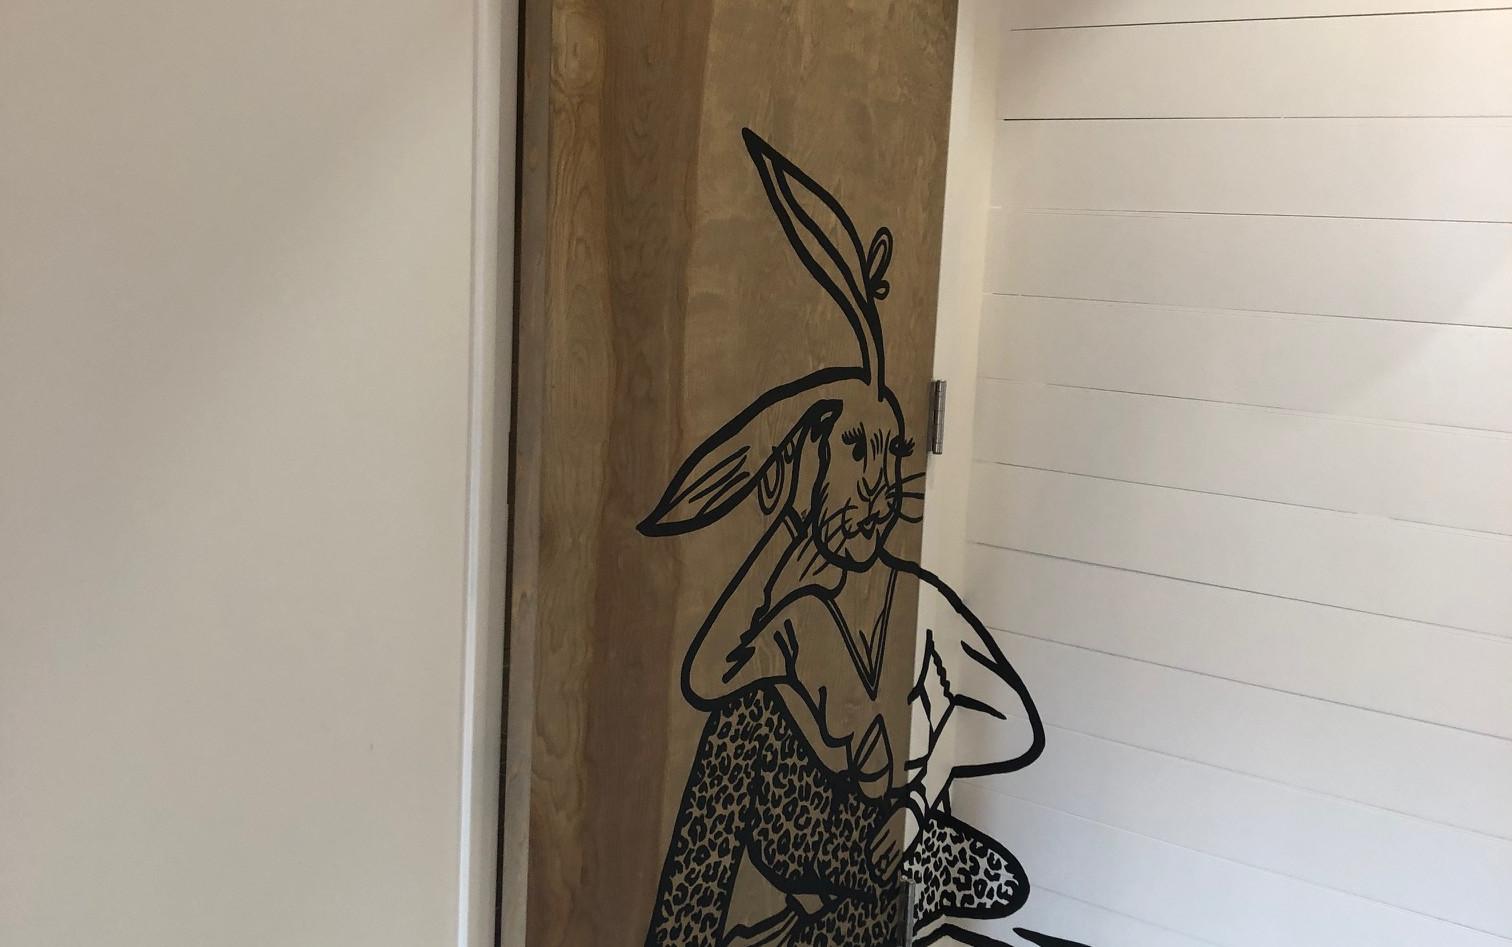 Hoppin' Rabbit Femal Bathroom Door